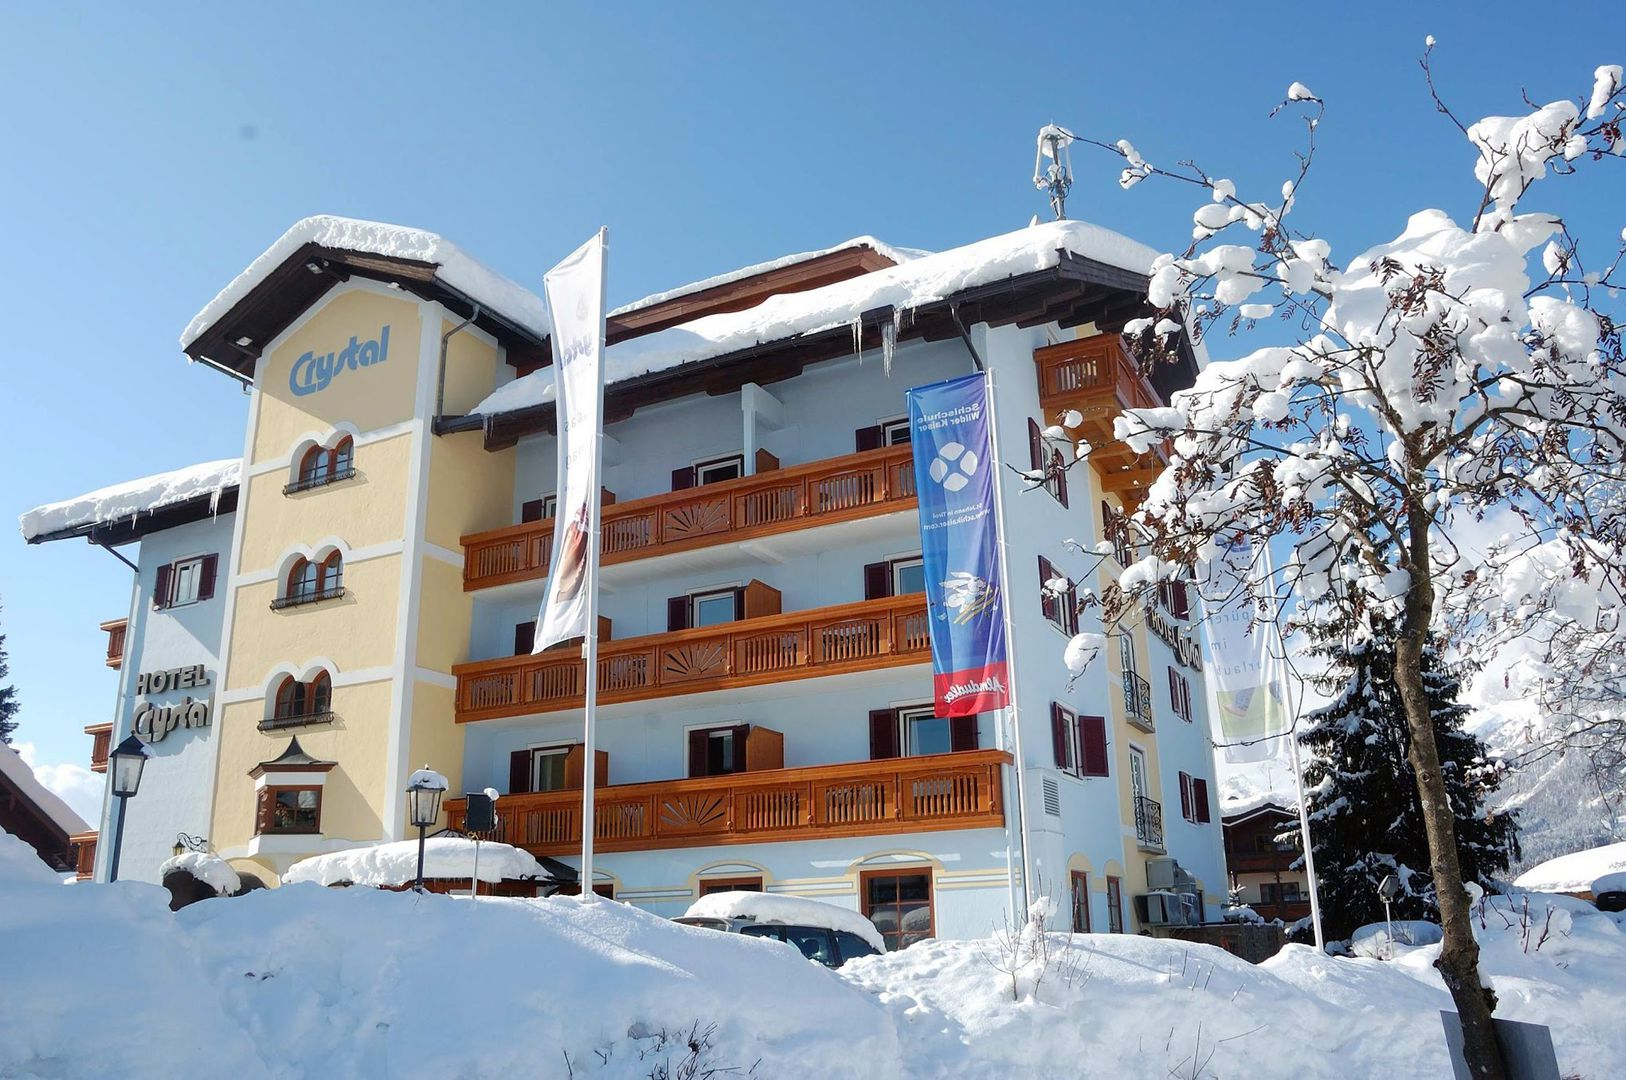 Slide1 - Hotel Crystal Das Alpenrefugium